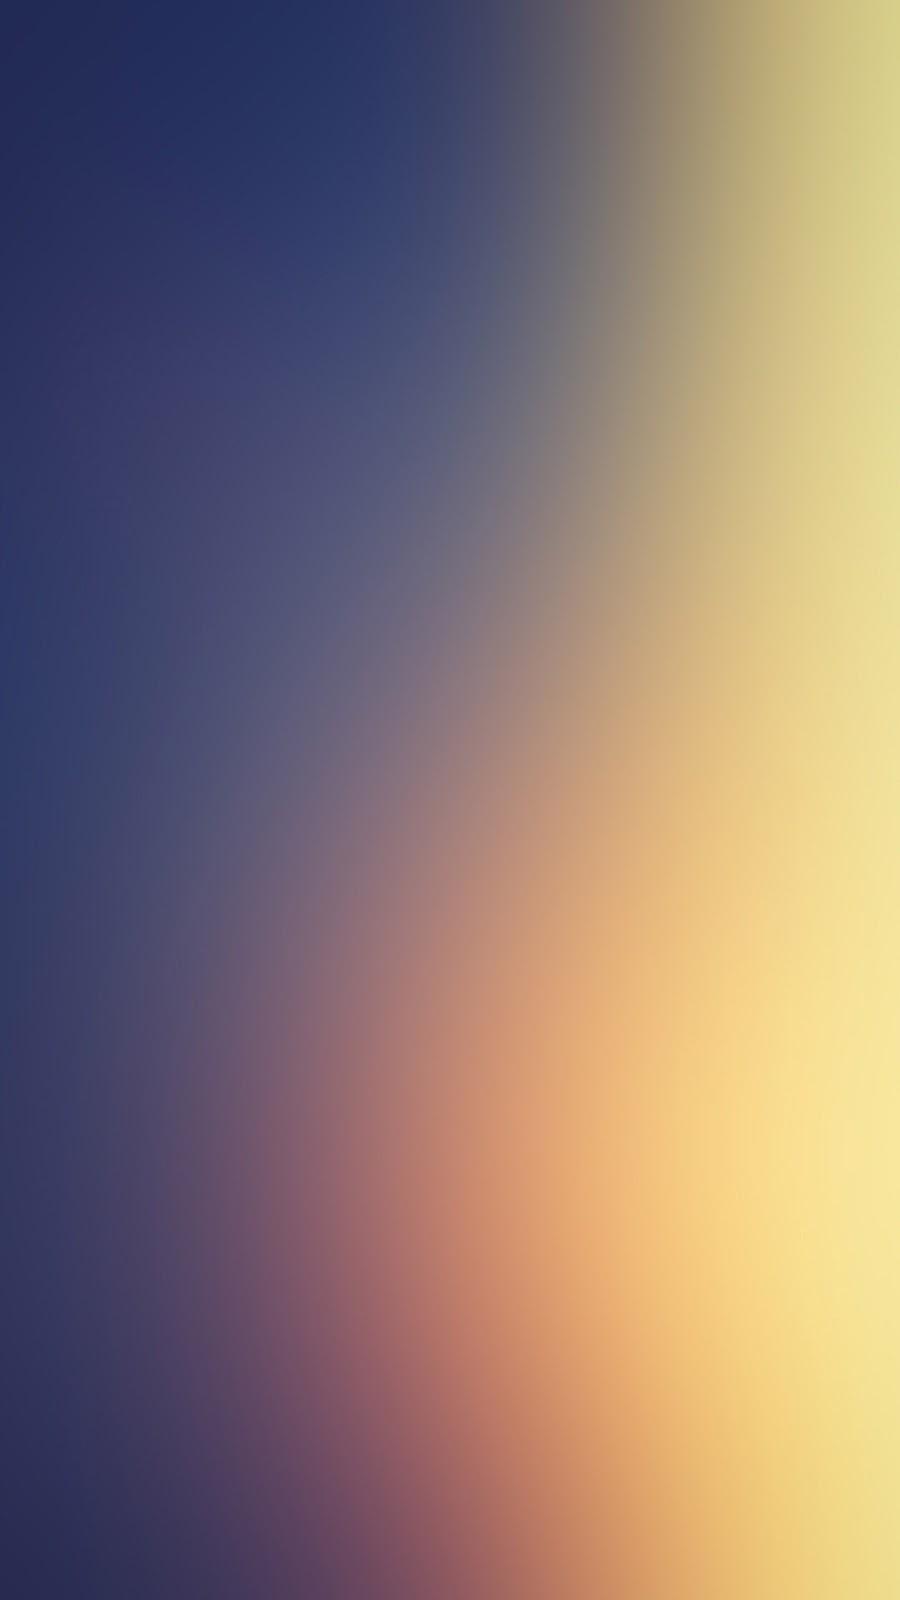 Amazing Wallpapers For Iphone 4 تحميل خلفيات ايفون 6 بلس الجديدة عالية الدقة مداد الجليد